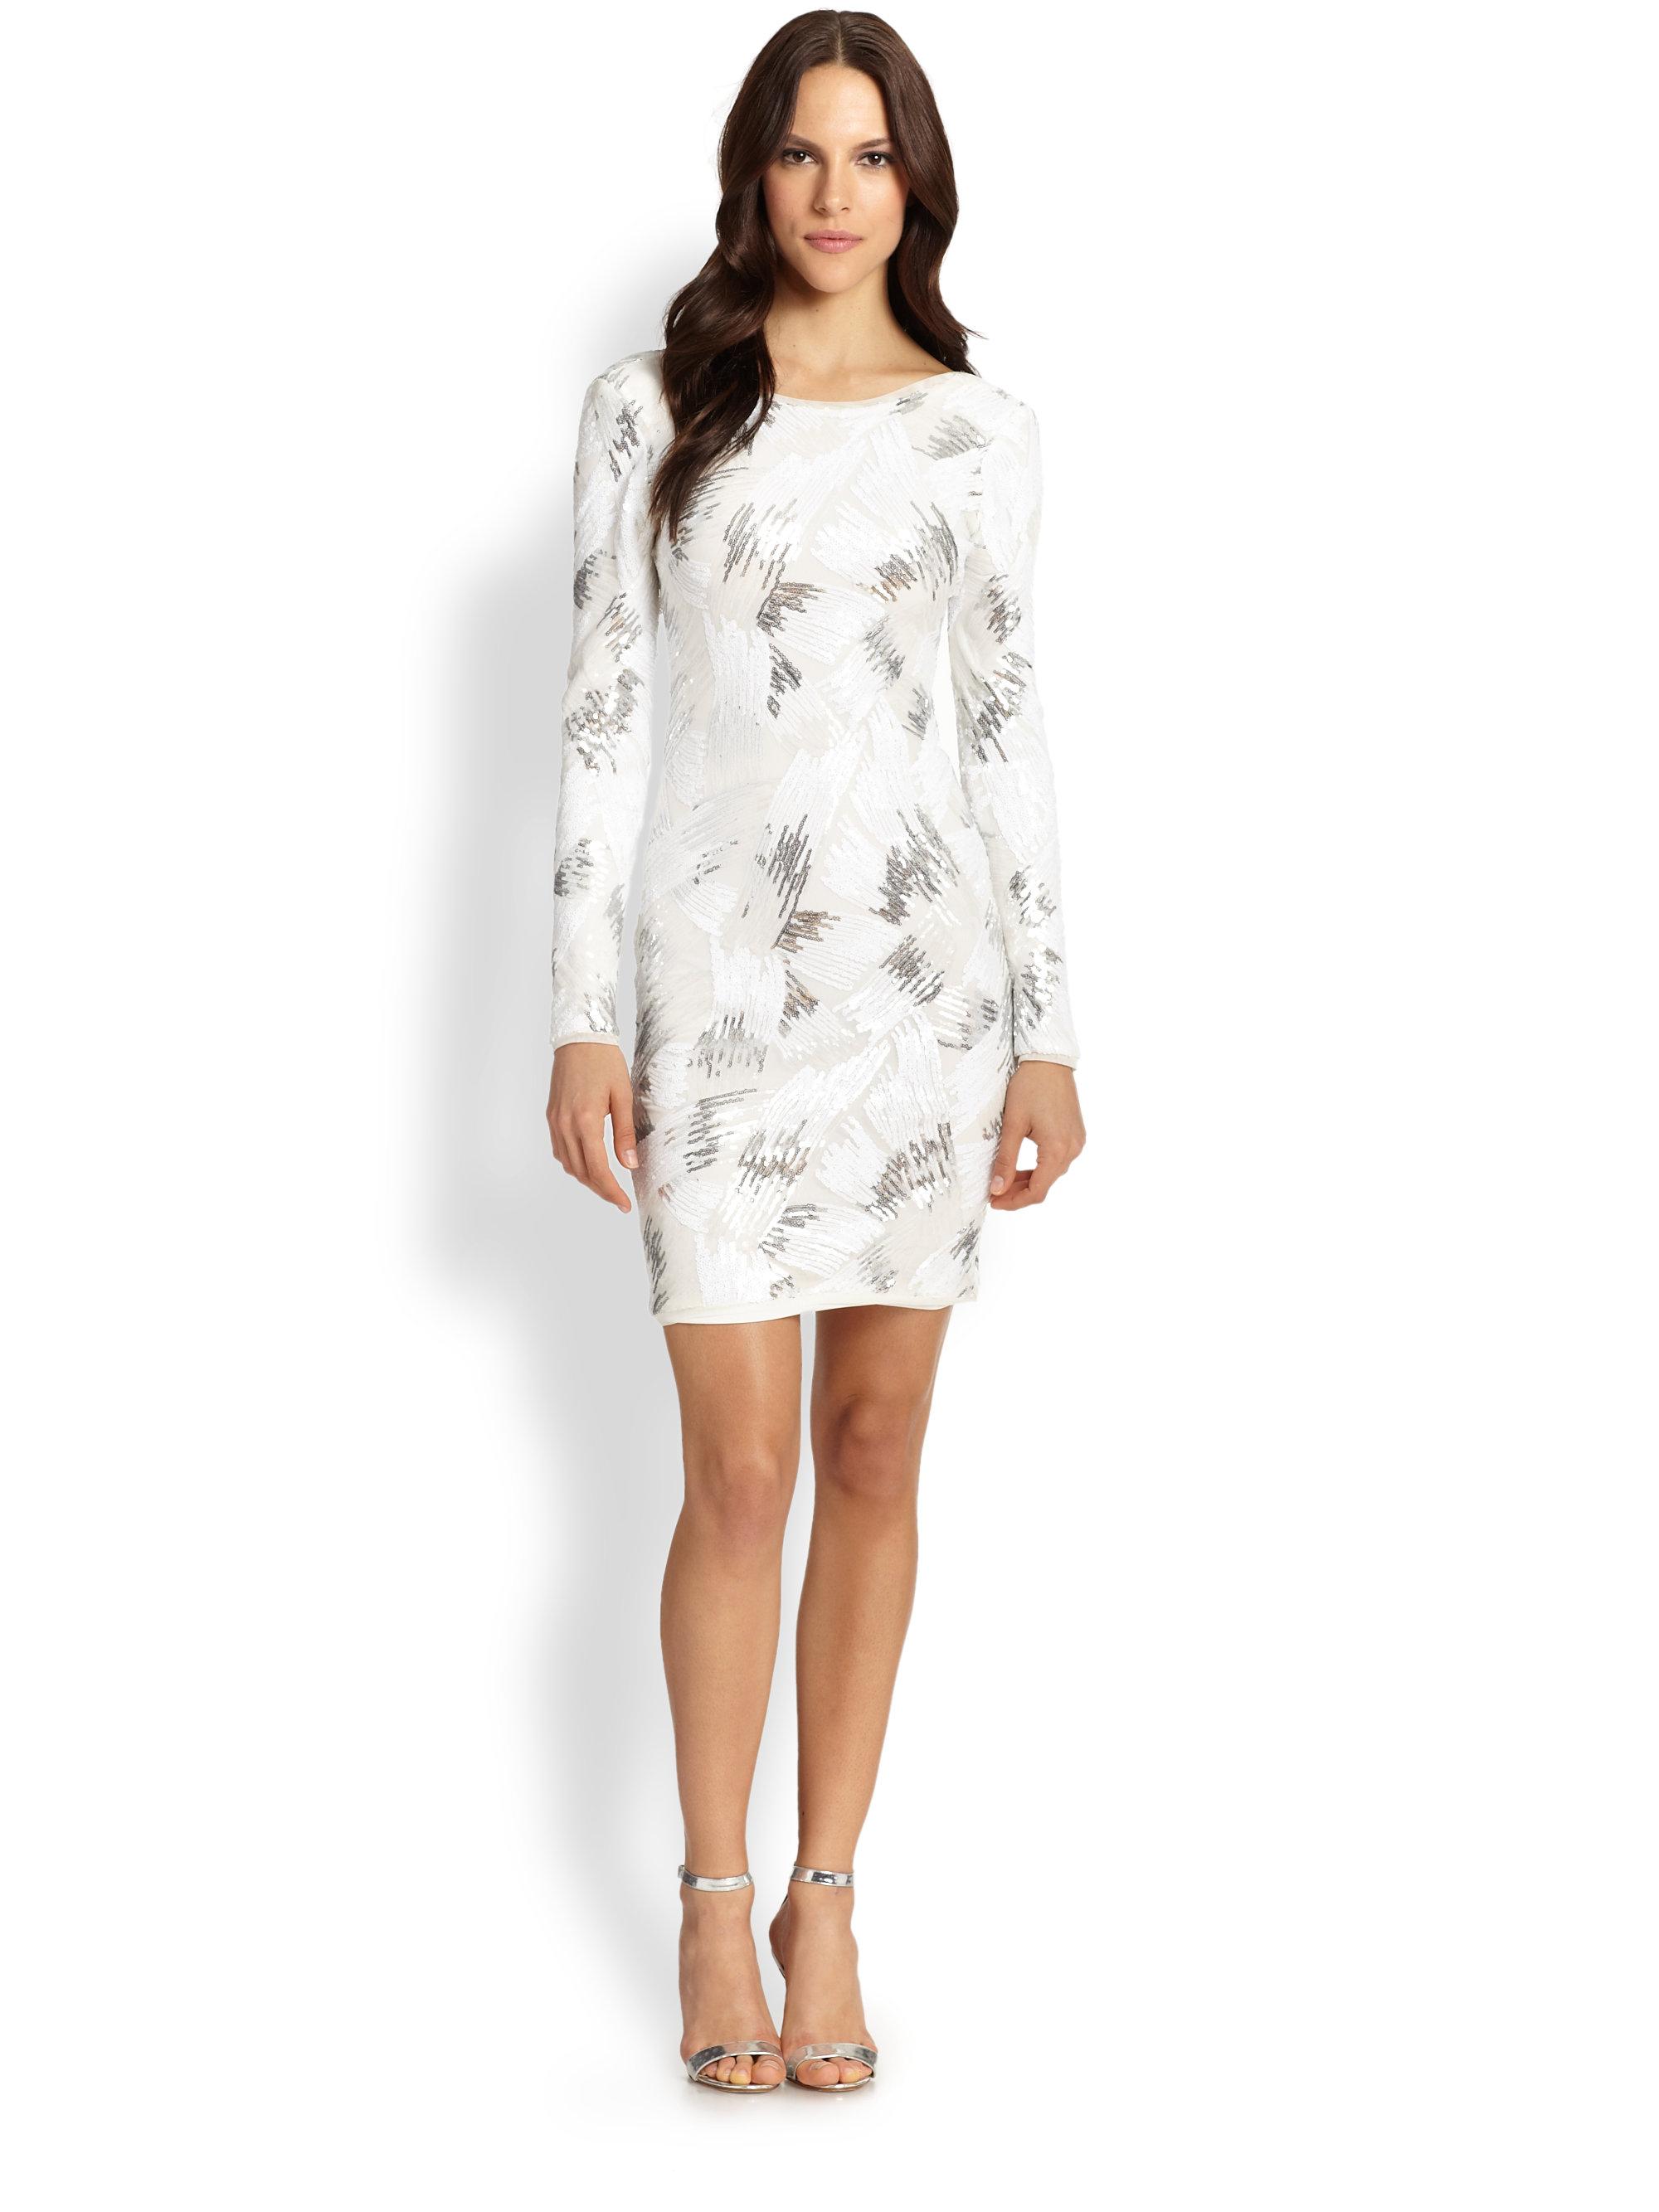 Saks Designer Dress Sale